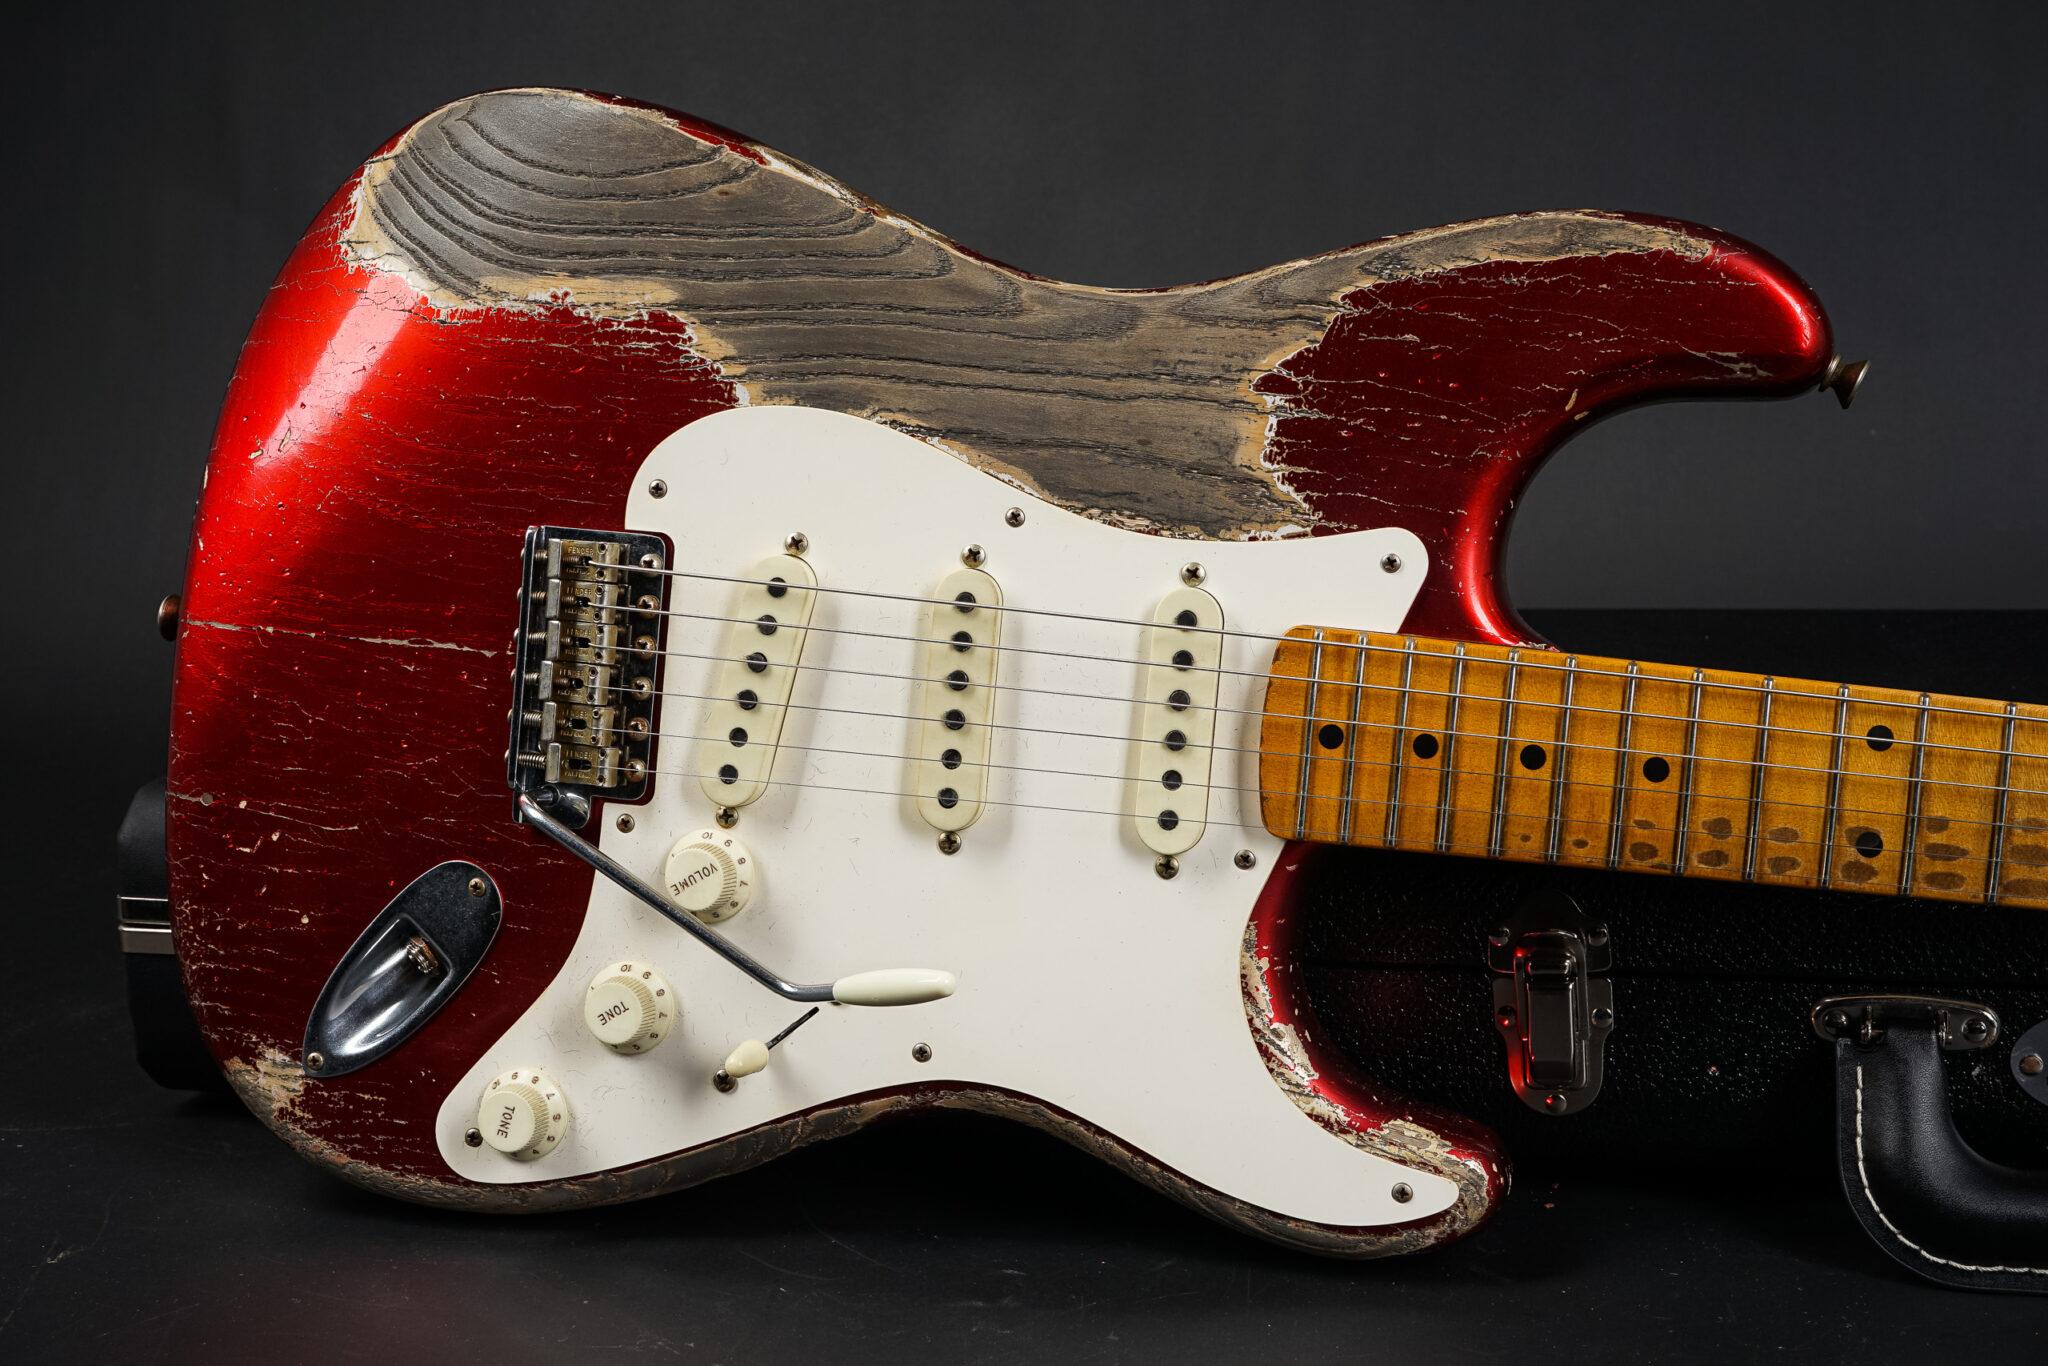 https://guitarpoint.de/app/uploads/products/2020-fender-greg-fessler-masterbuilt-1957-stratocaster-aged-candy-apple-red-heavy-relic/2020-Fender-MBGF-56Stratocaster-WildwoodR105156-8-2048x1366.jpg